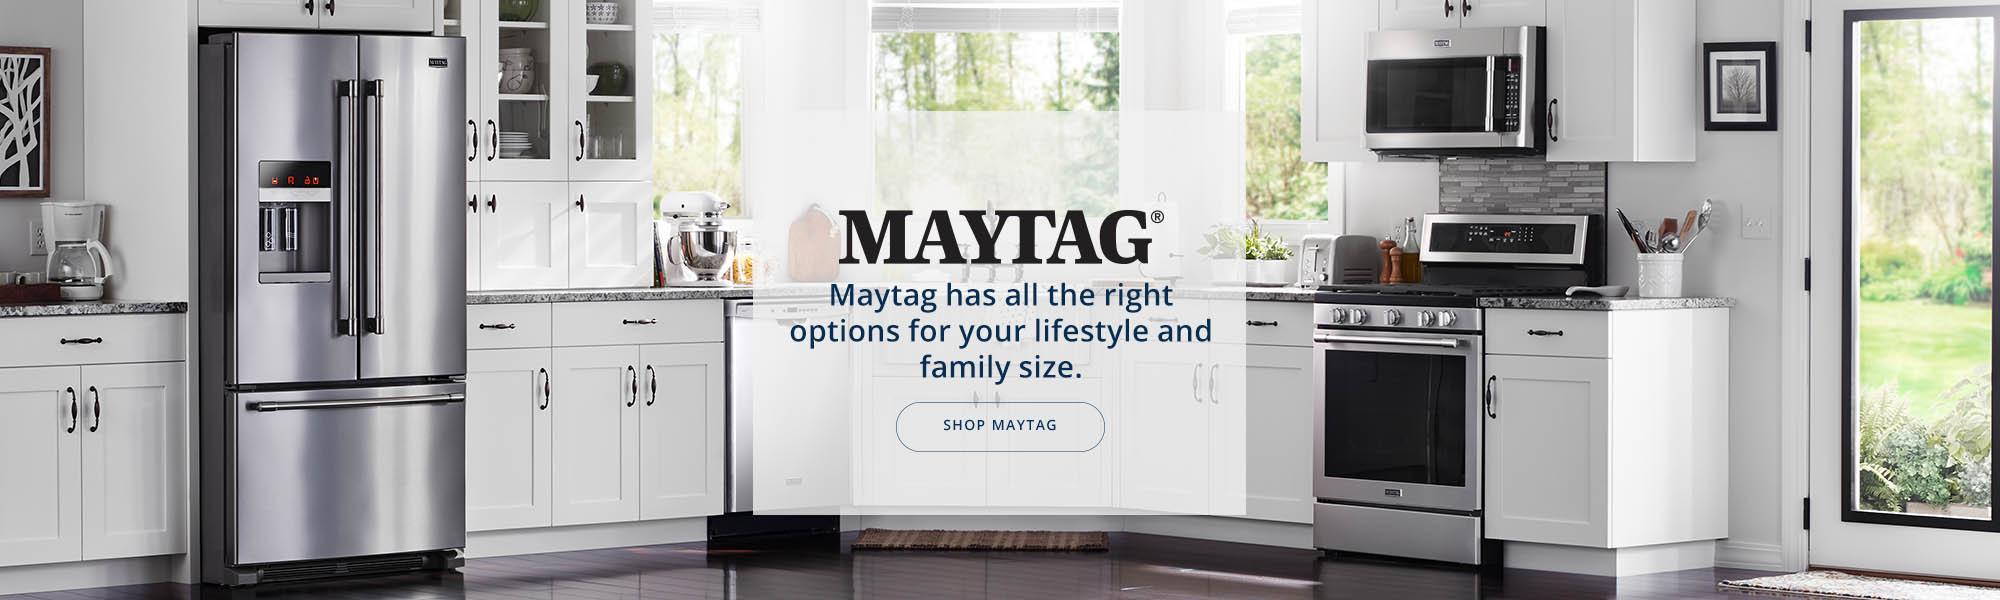 Maytag Slide